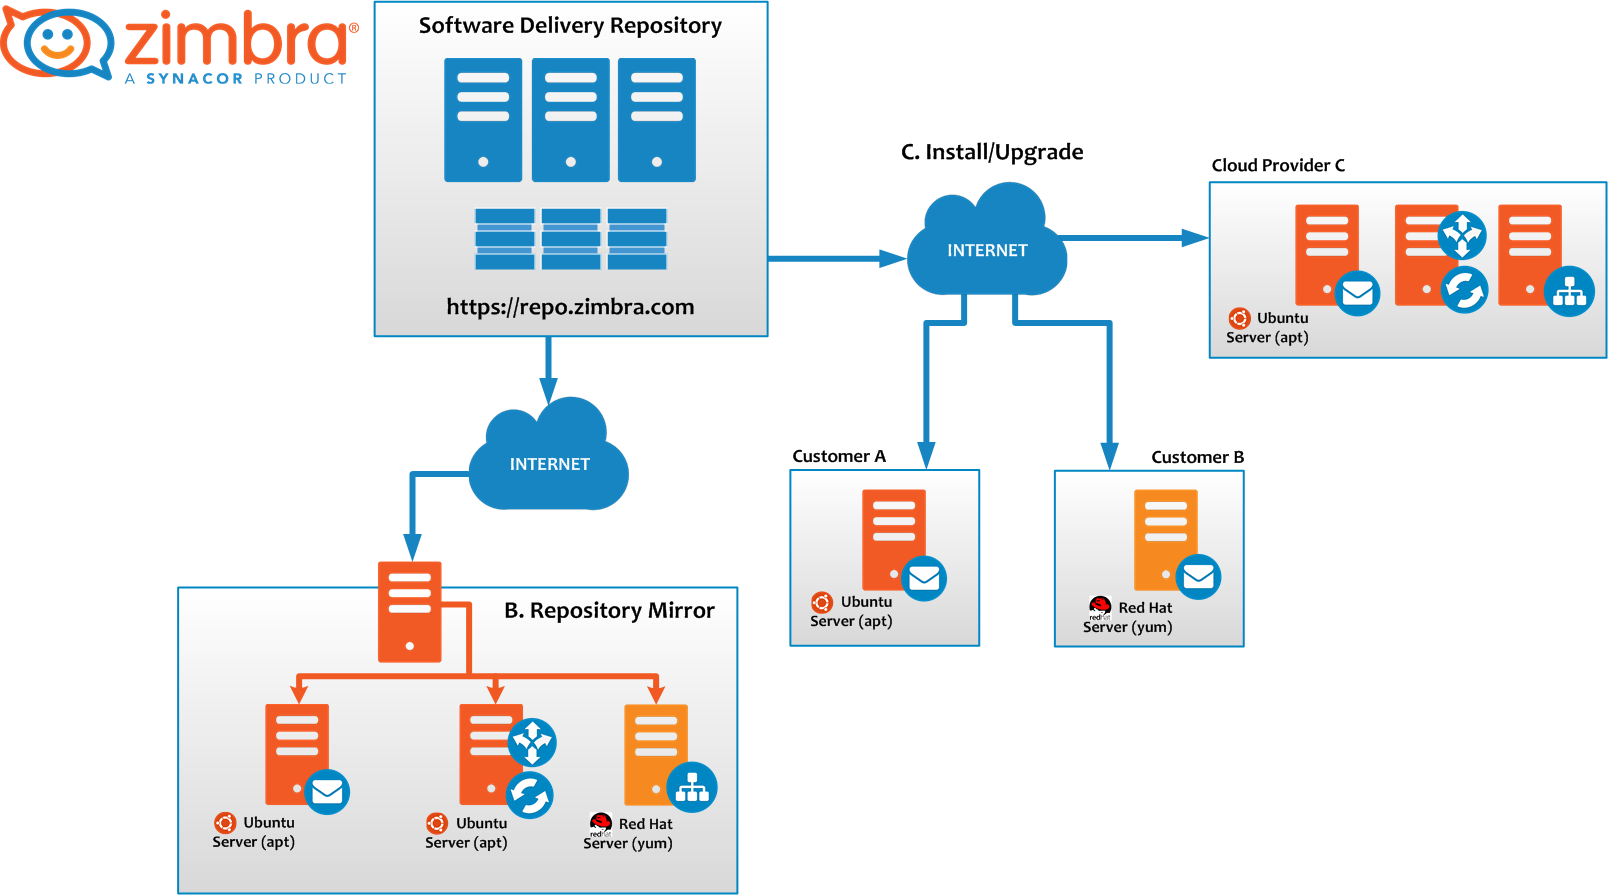 zimbra-repository.png